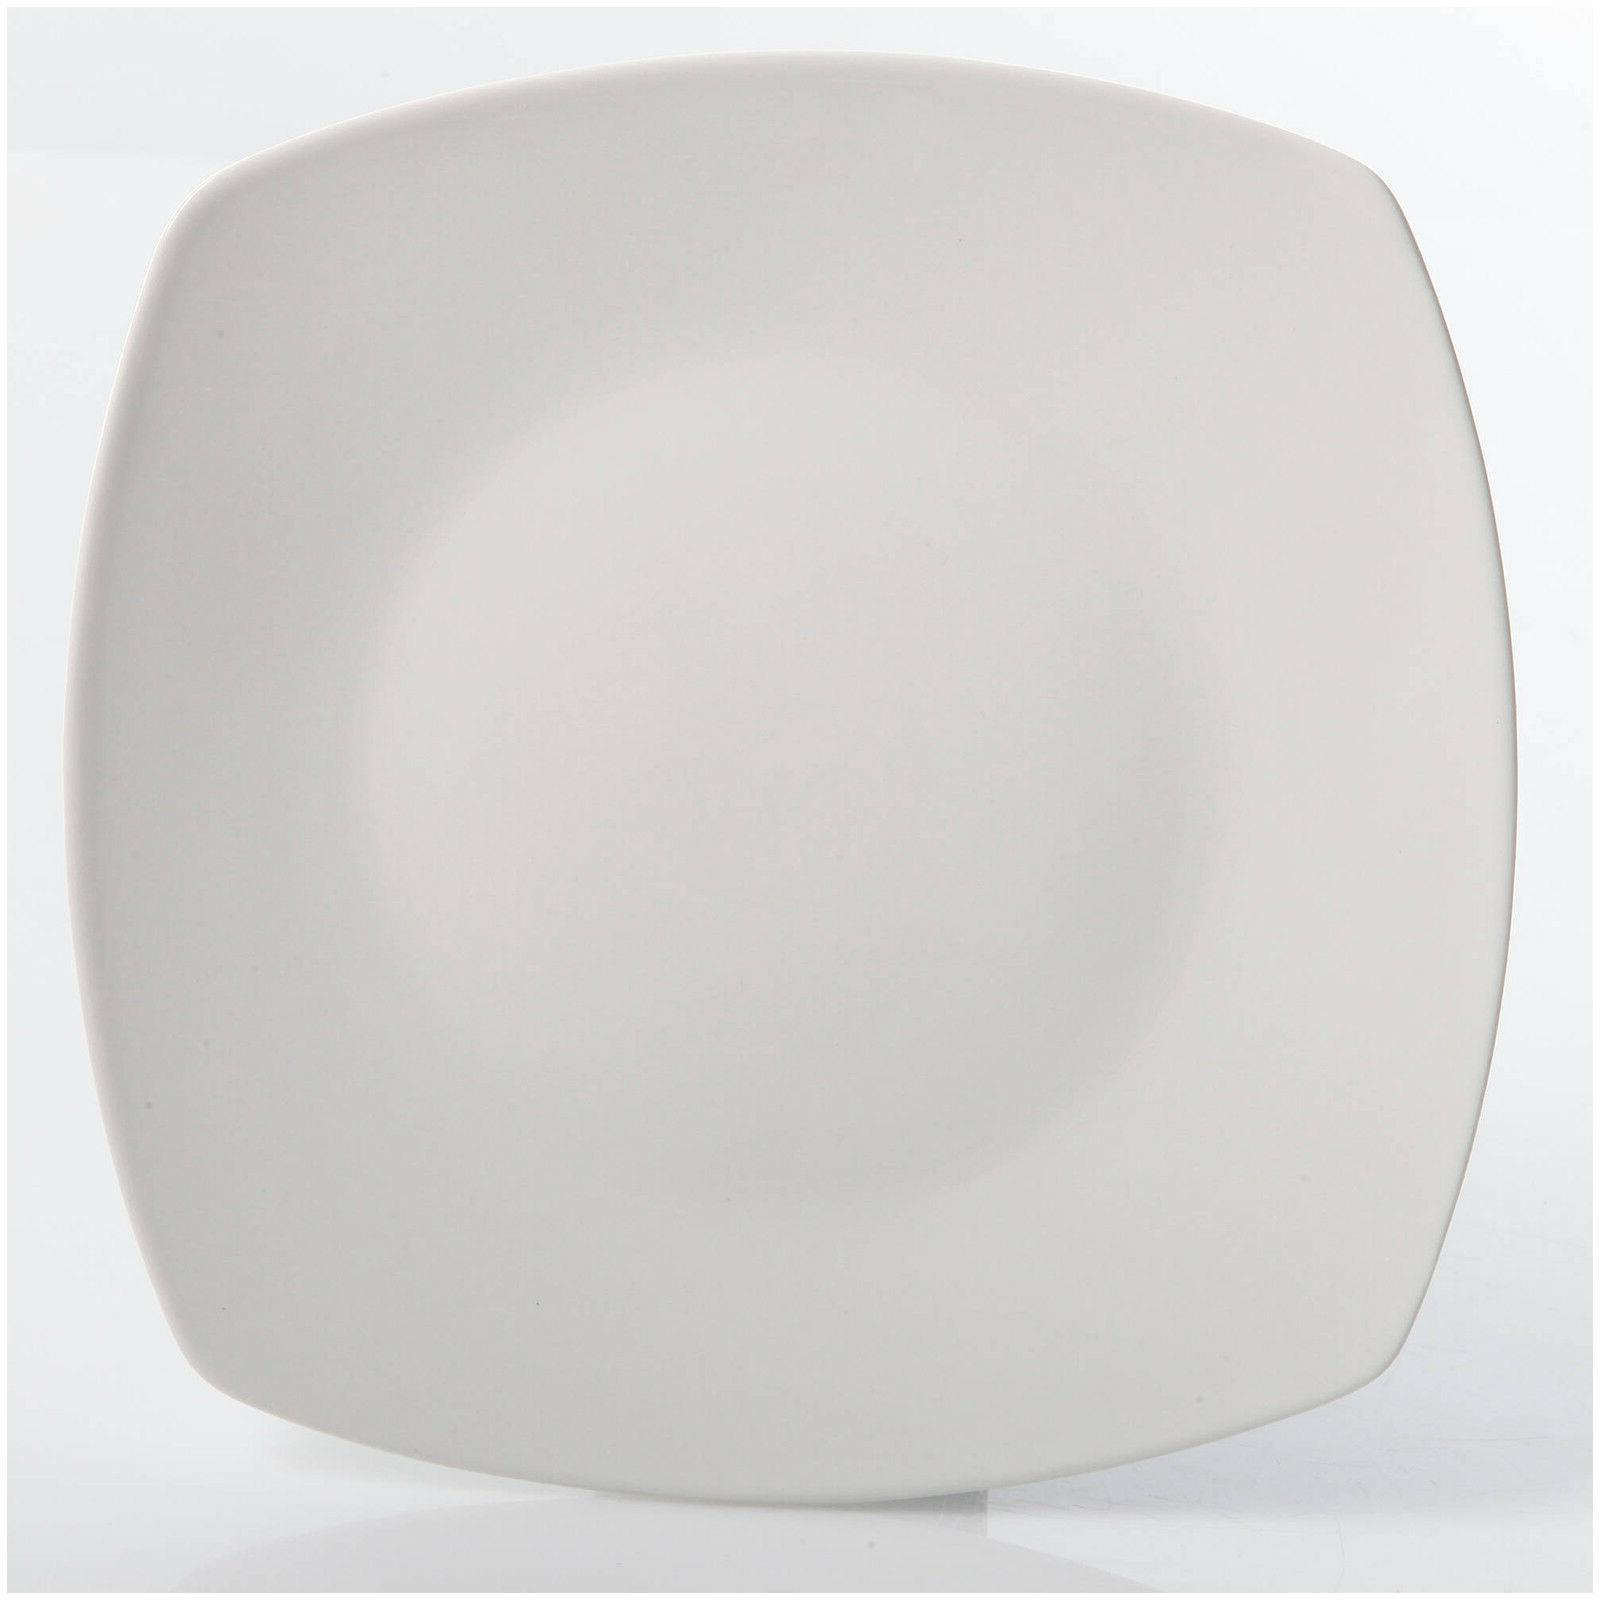 Porcelain Dinnerware Set For 6 Kitchen Plates Bowls Mugs Dishes